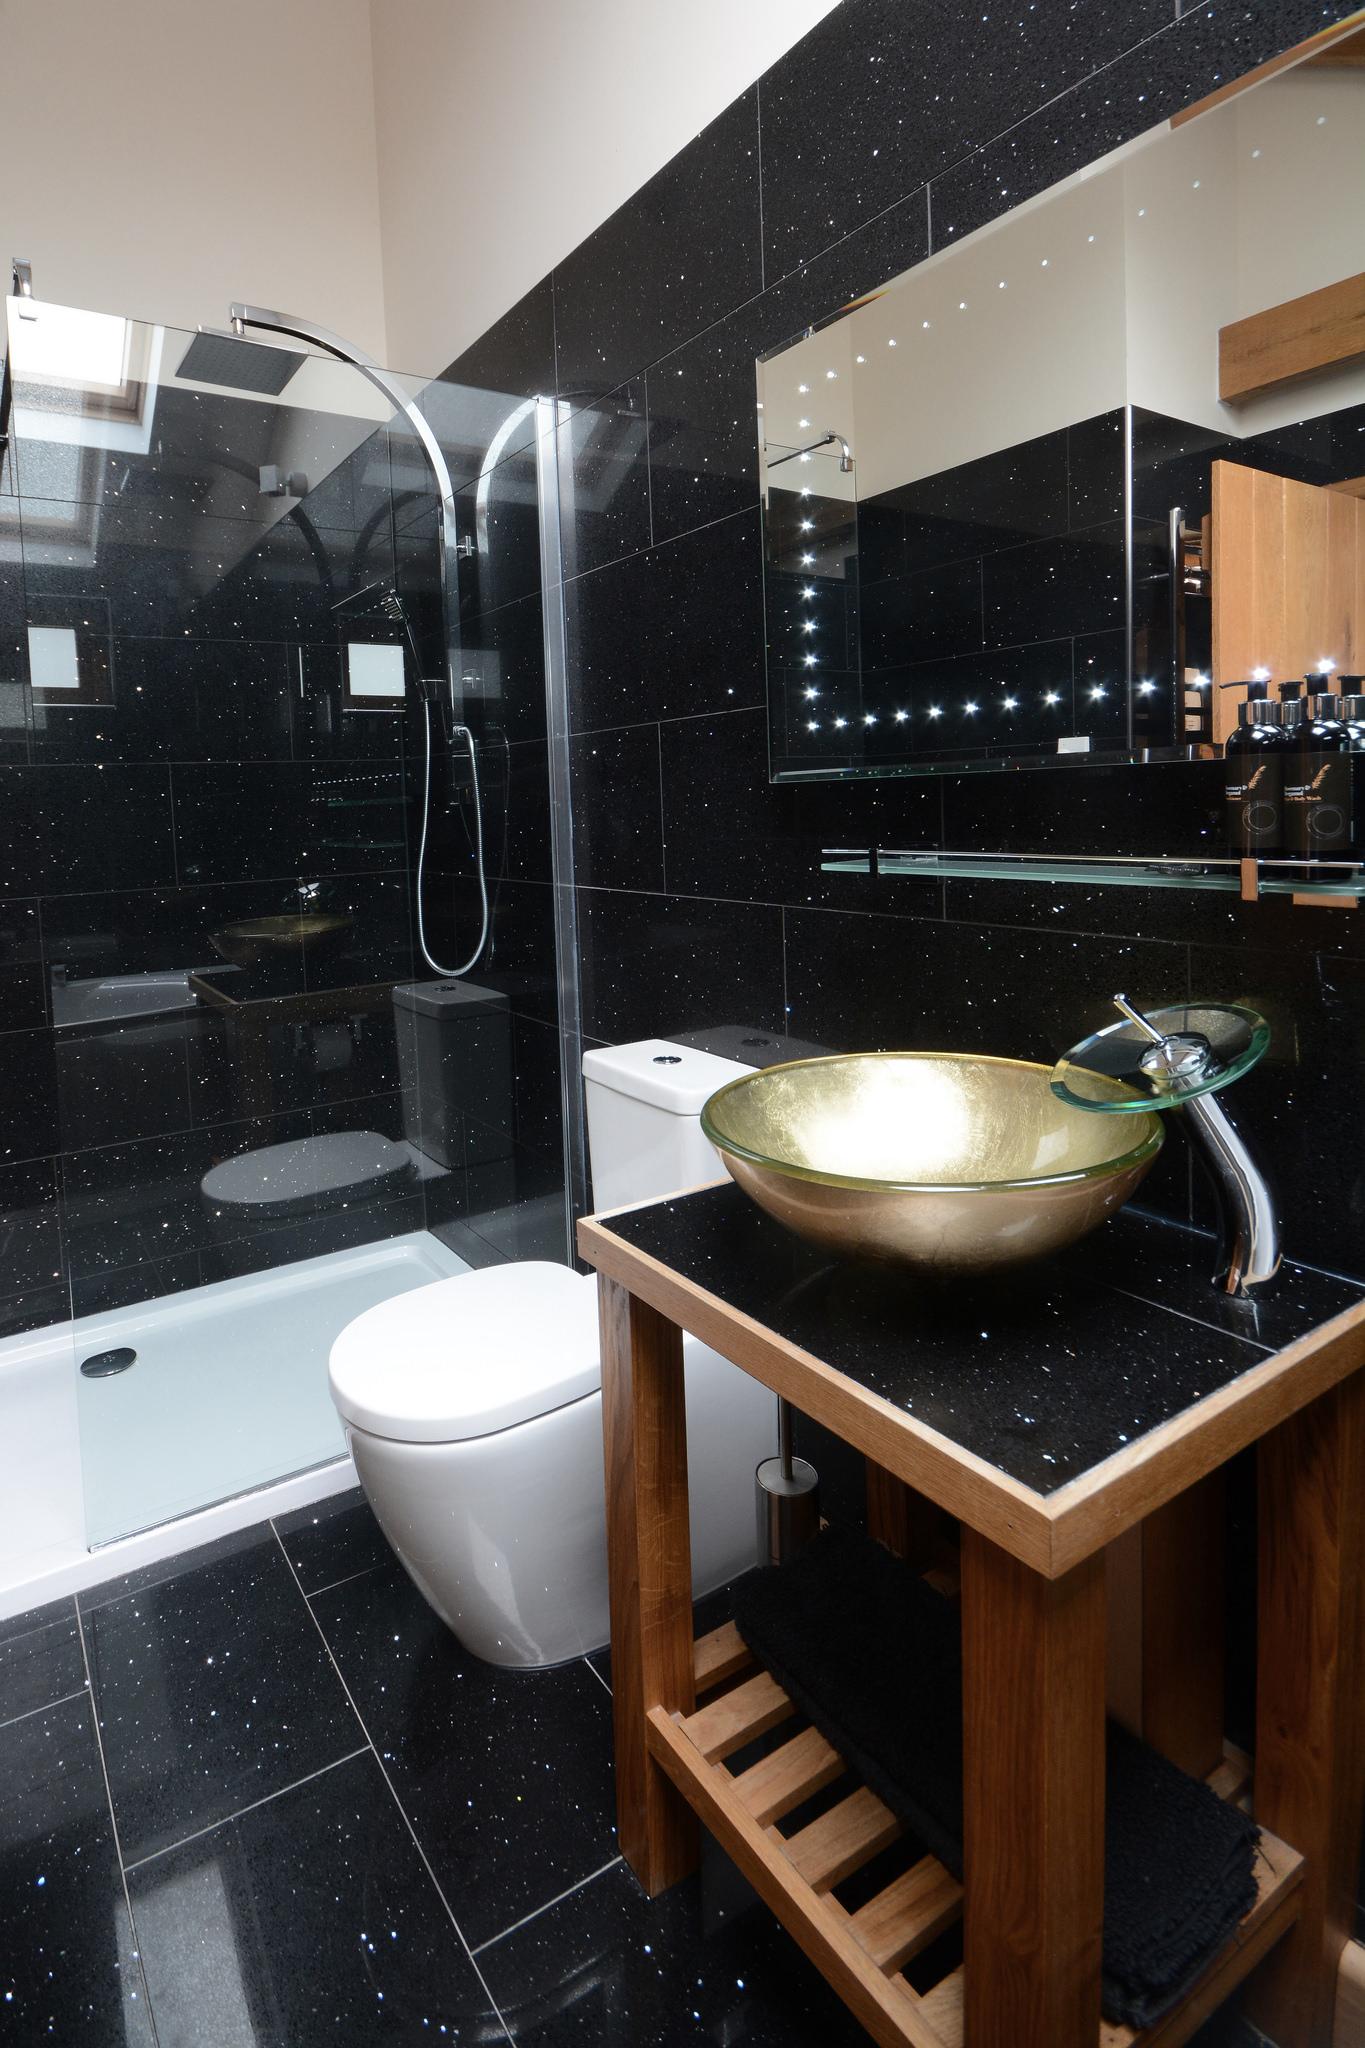 En-suite bathroom with walk-in rainfall shower